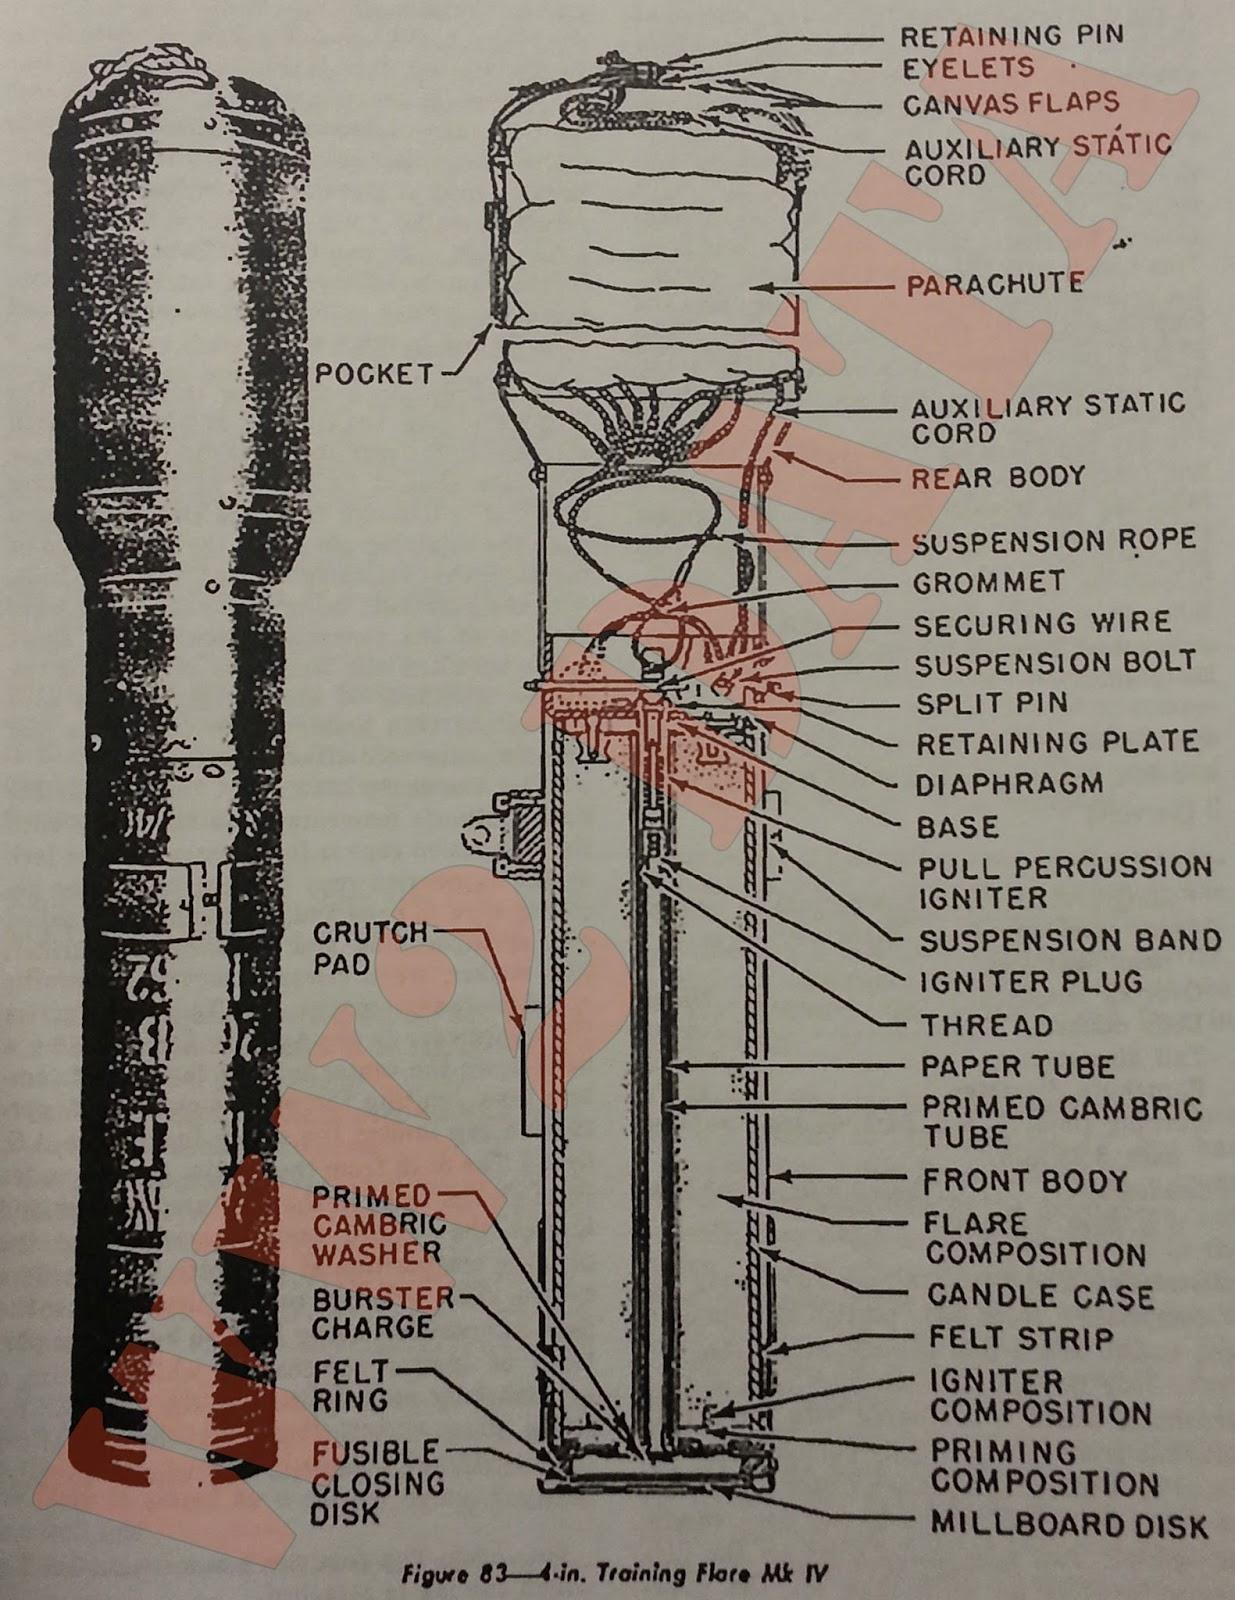 WW2 Equipment Data: British Explosive Ordnance - Flares and